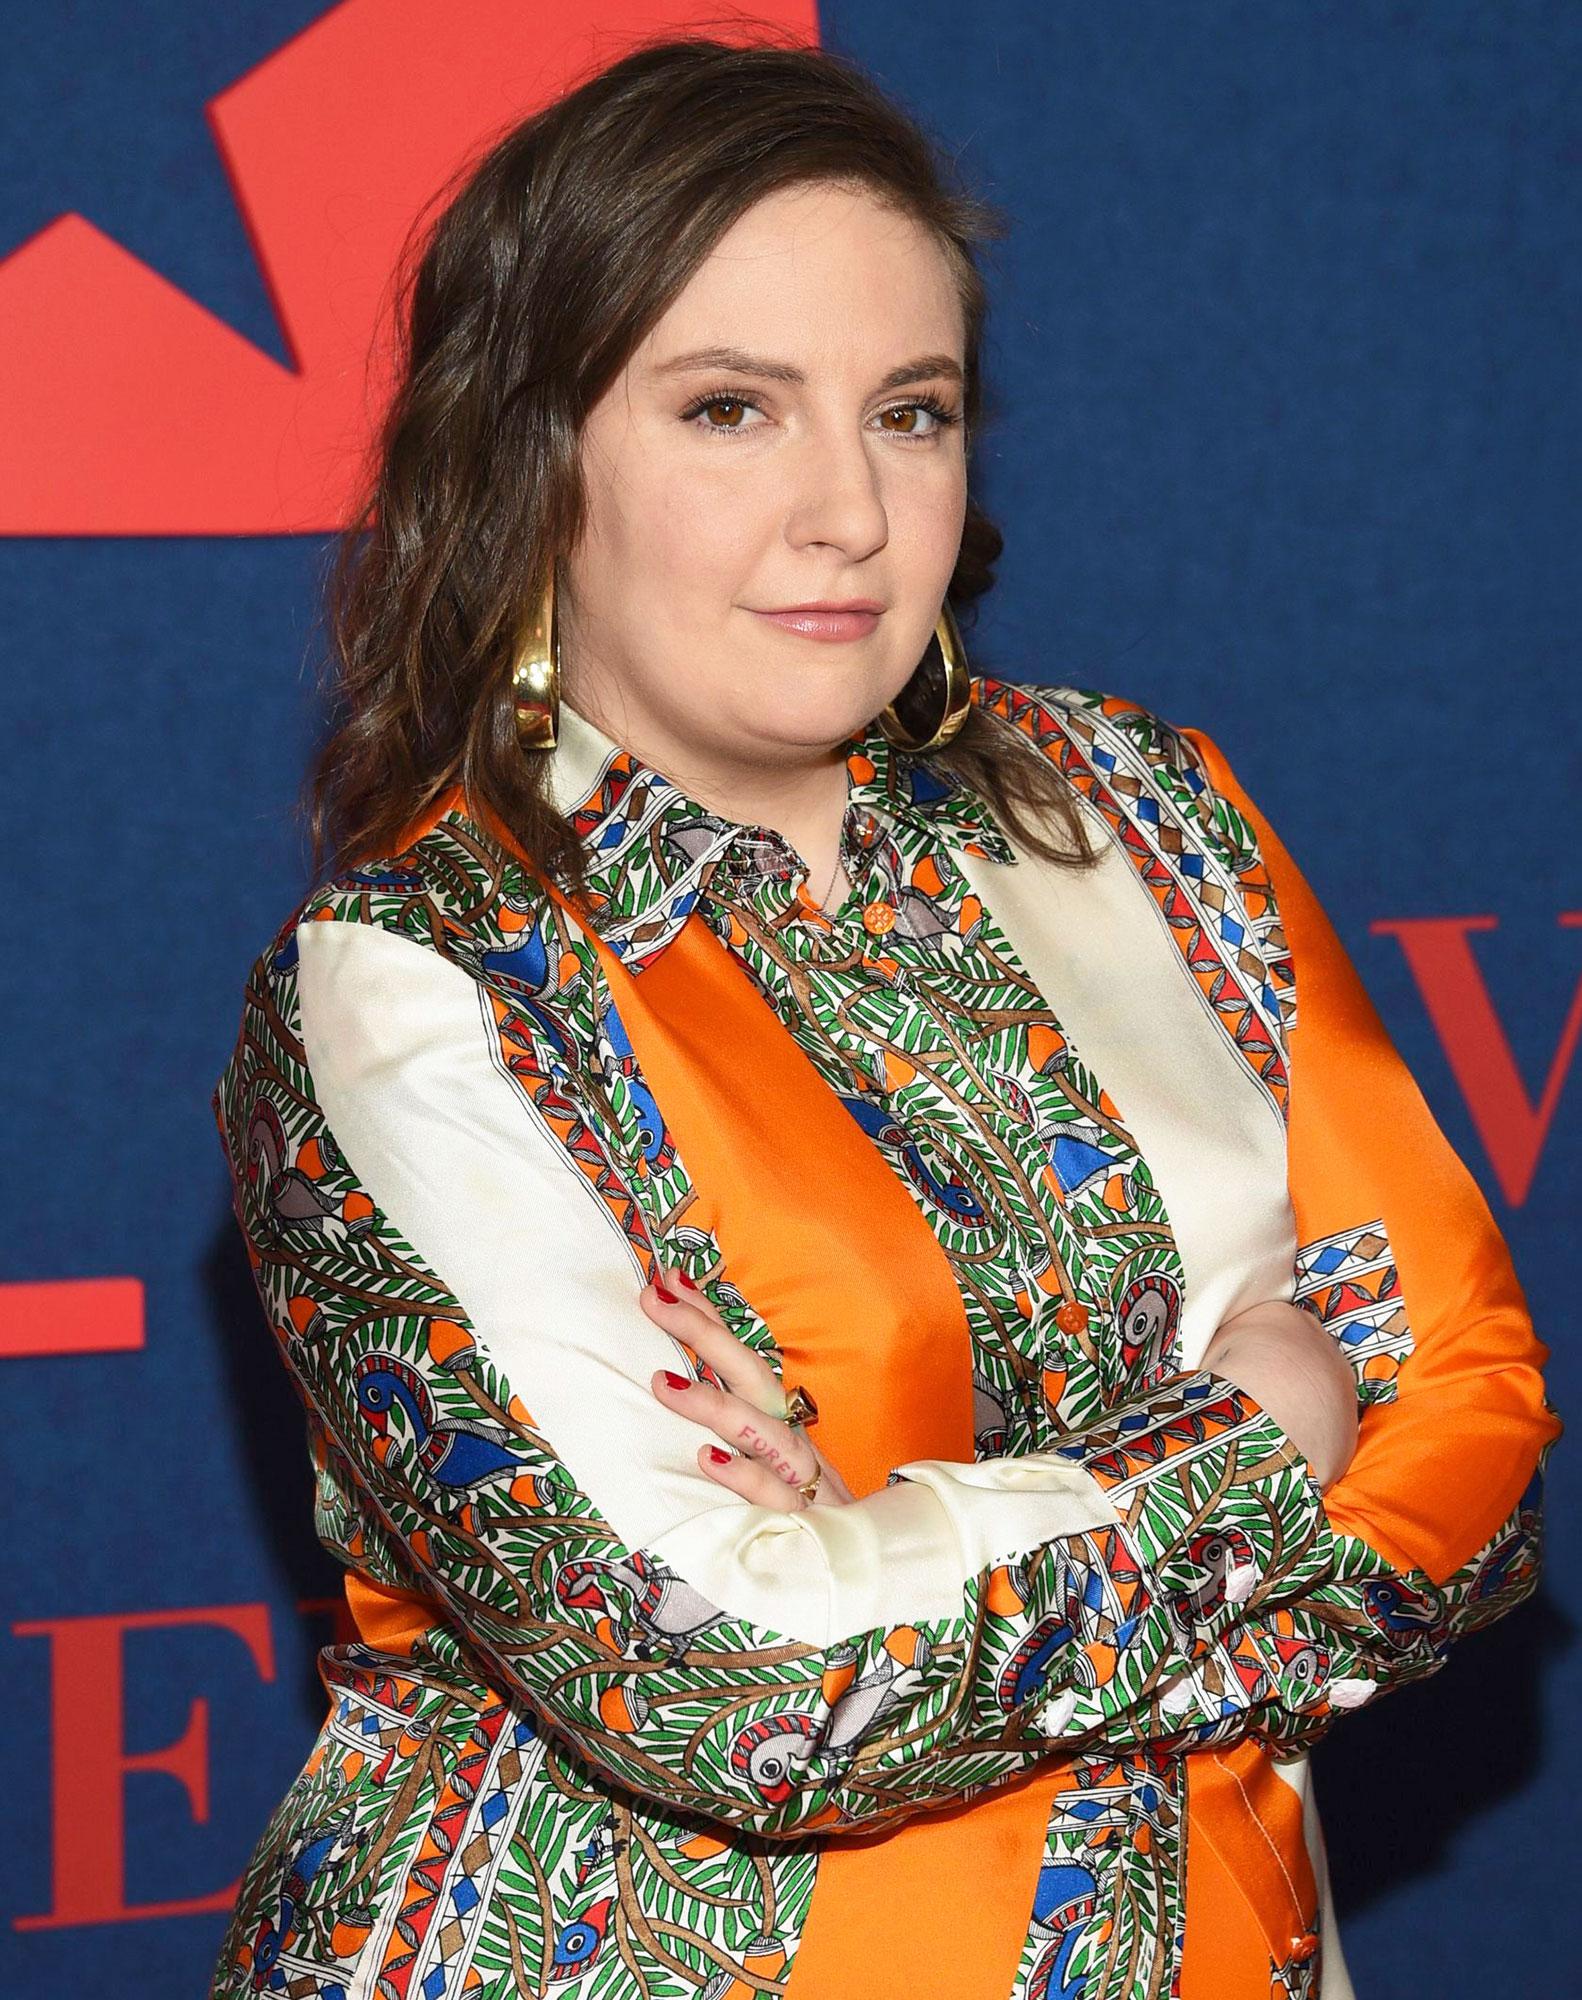 Lena Dunham's Plus Size Clothing Line Starts at $98